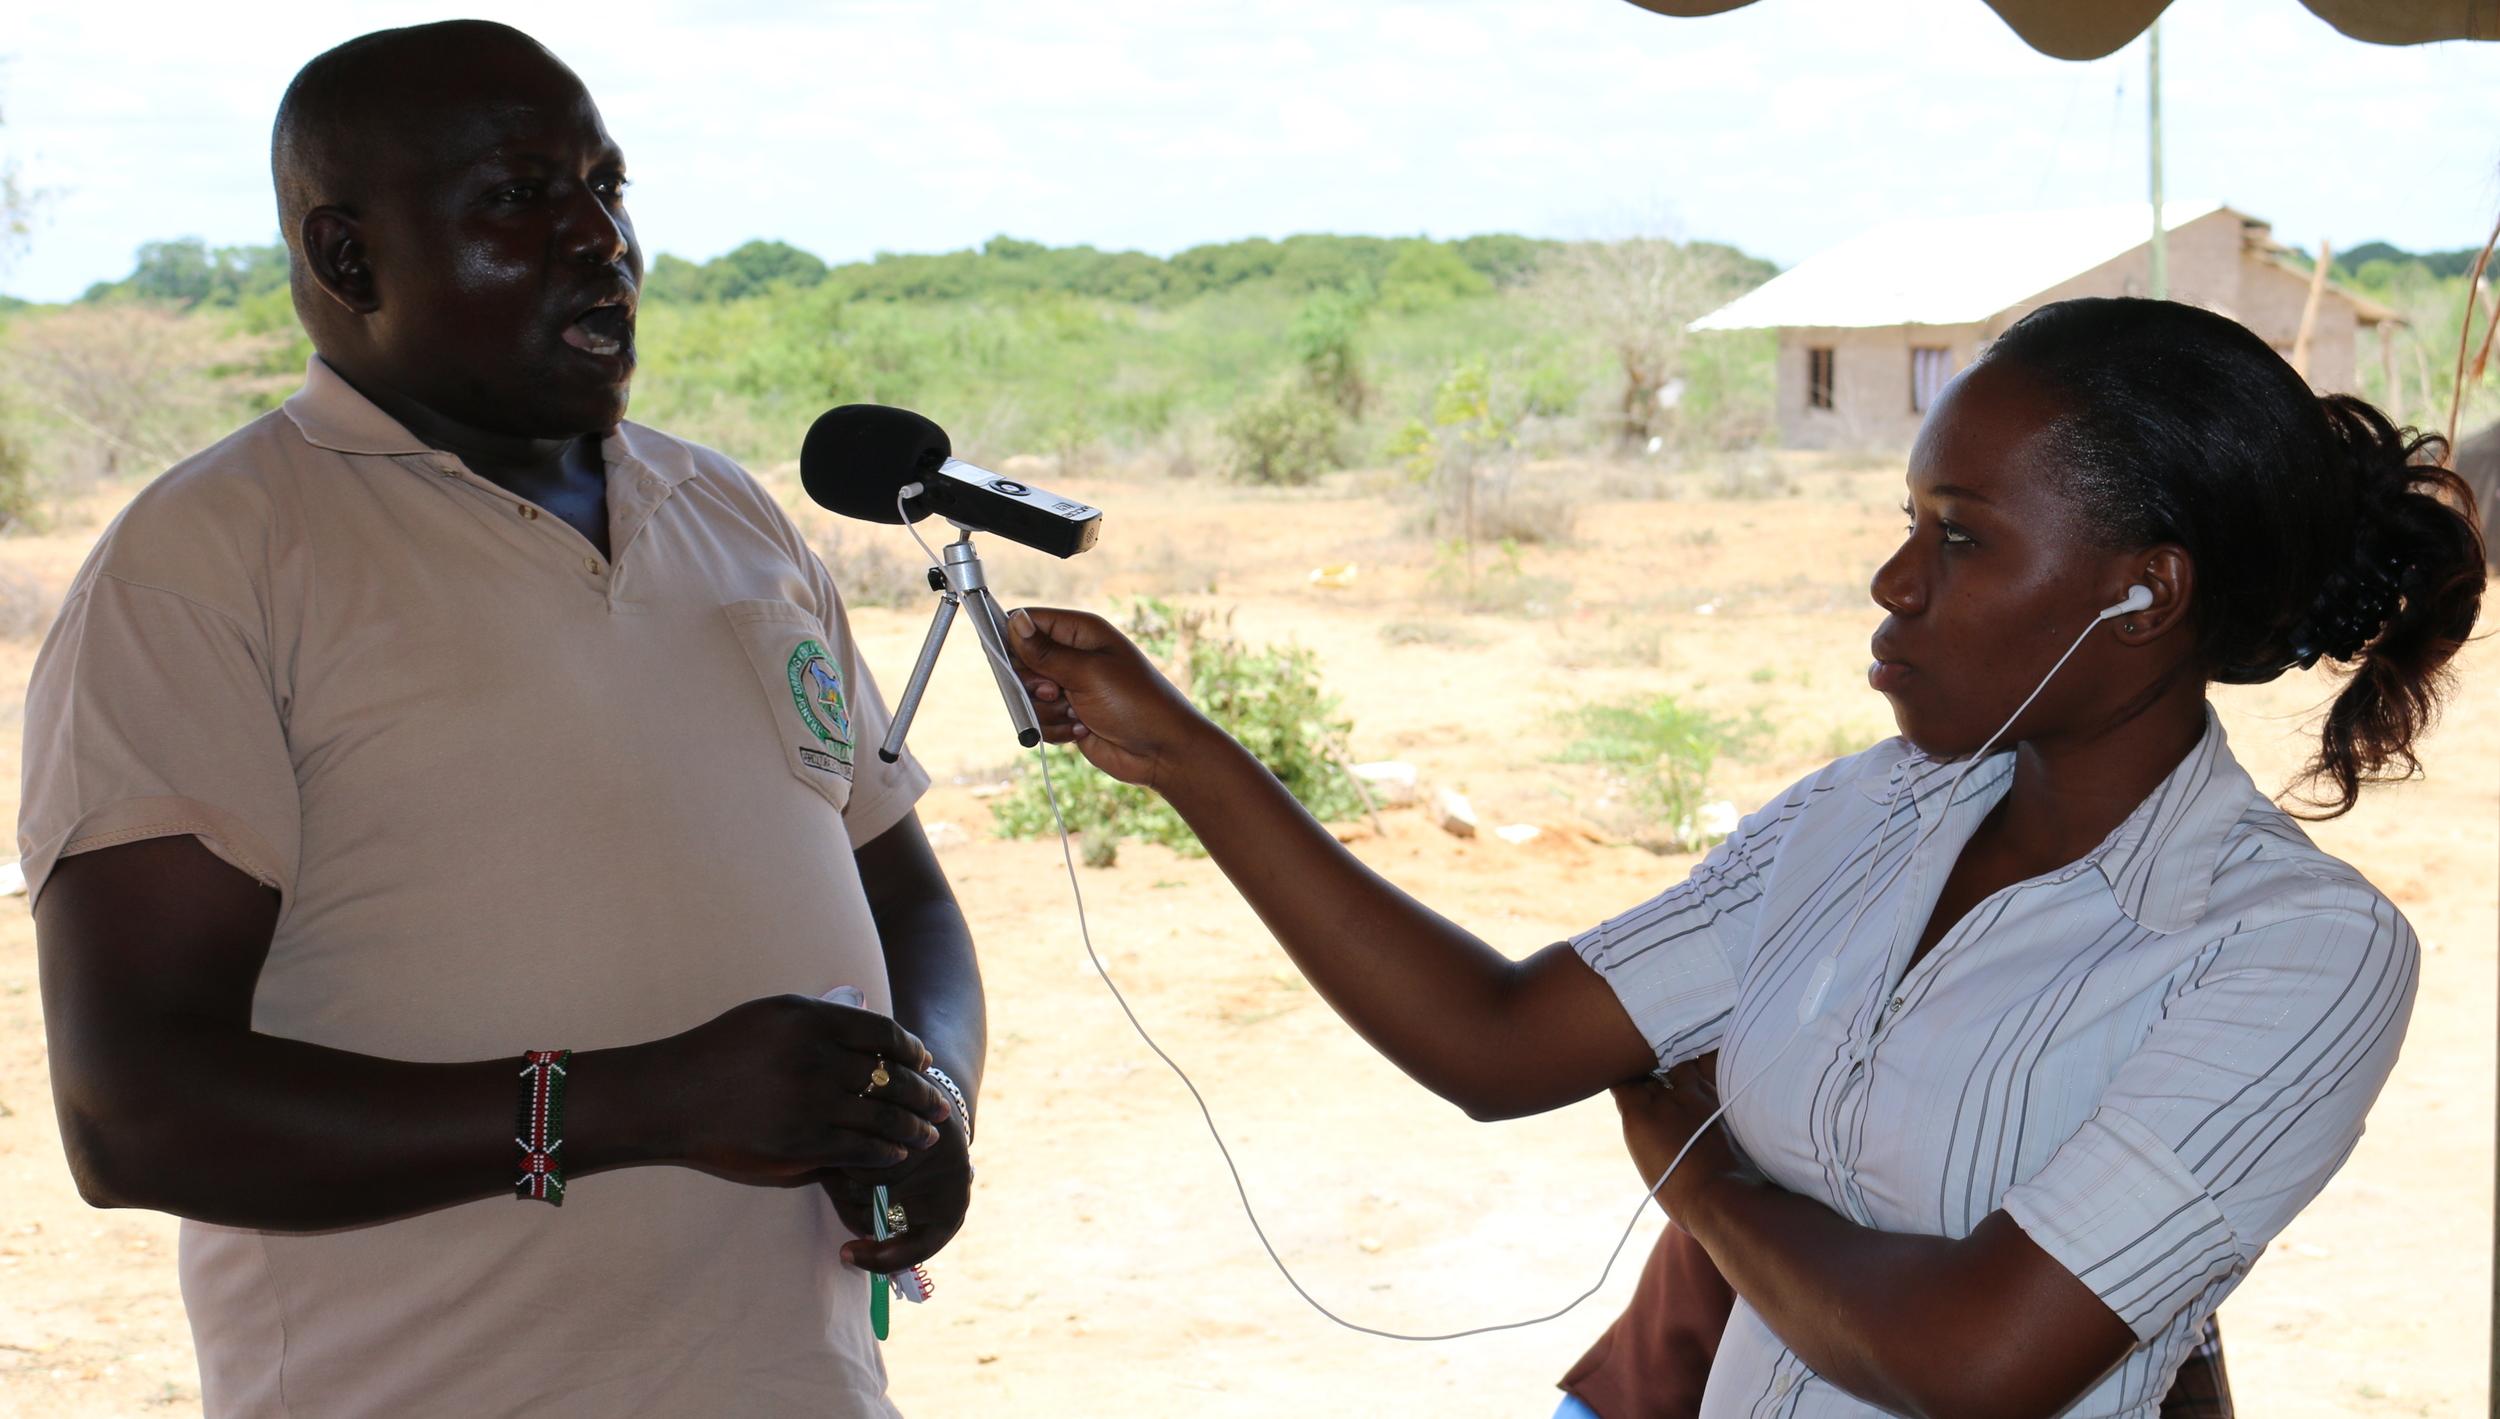 Tana FM producer Maureen talks to Peter Munyonki from the County's Disaster Response Team